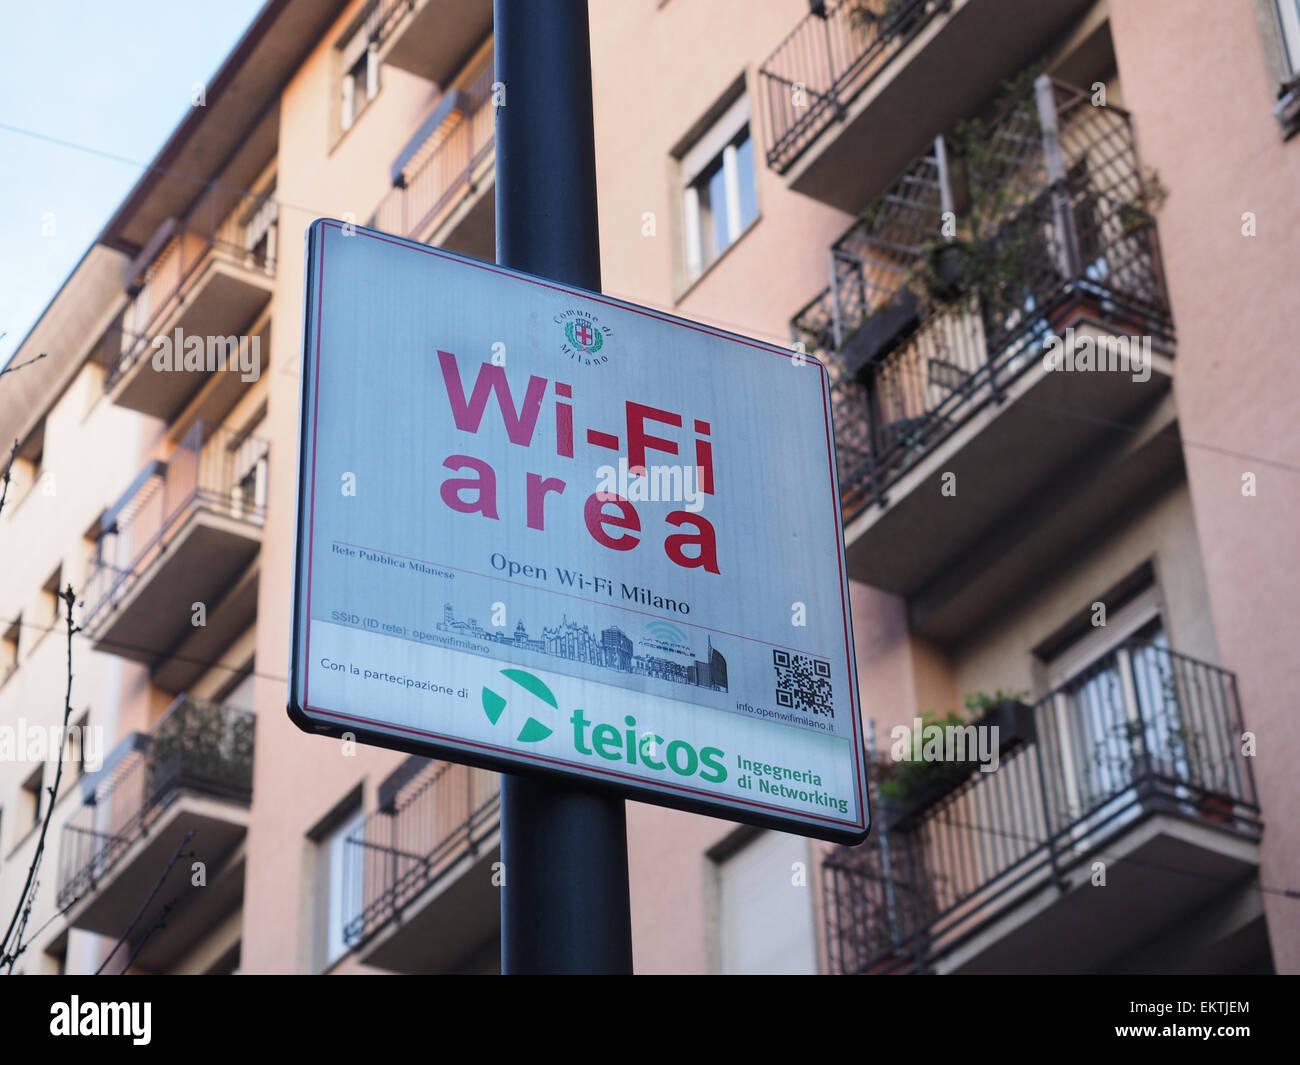 Zona Wi-Fi signo, Corso Garibaldi street, distrito de Brera, Milán, Lombardía, Italia, Europa Imagen De Stock